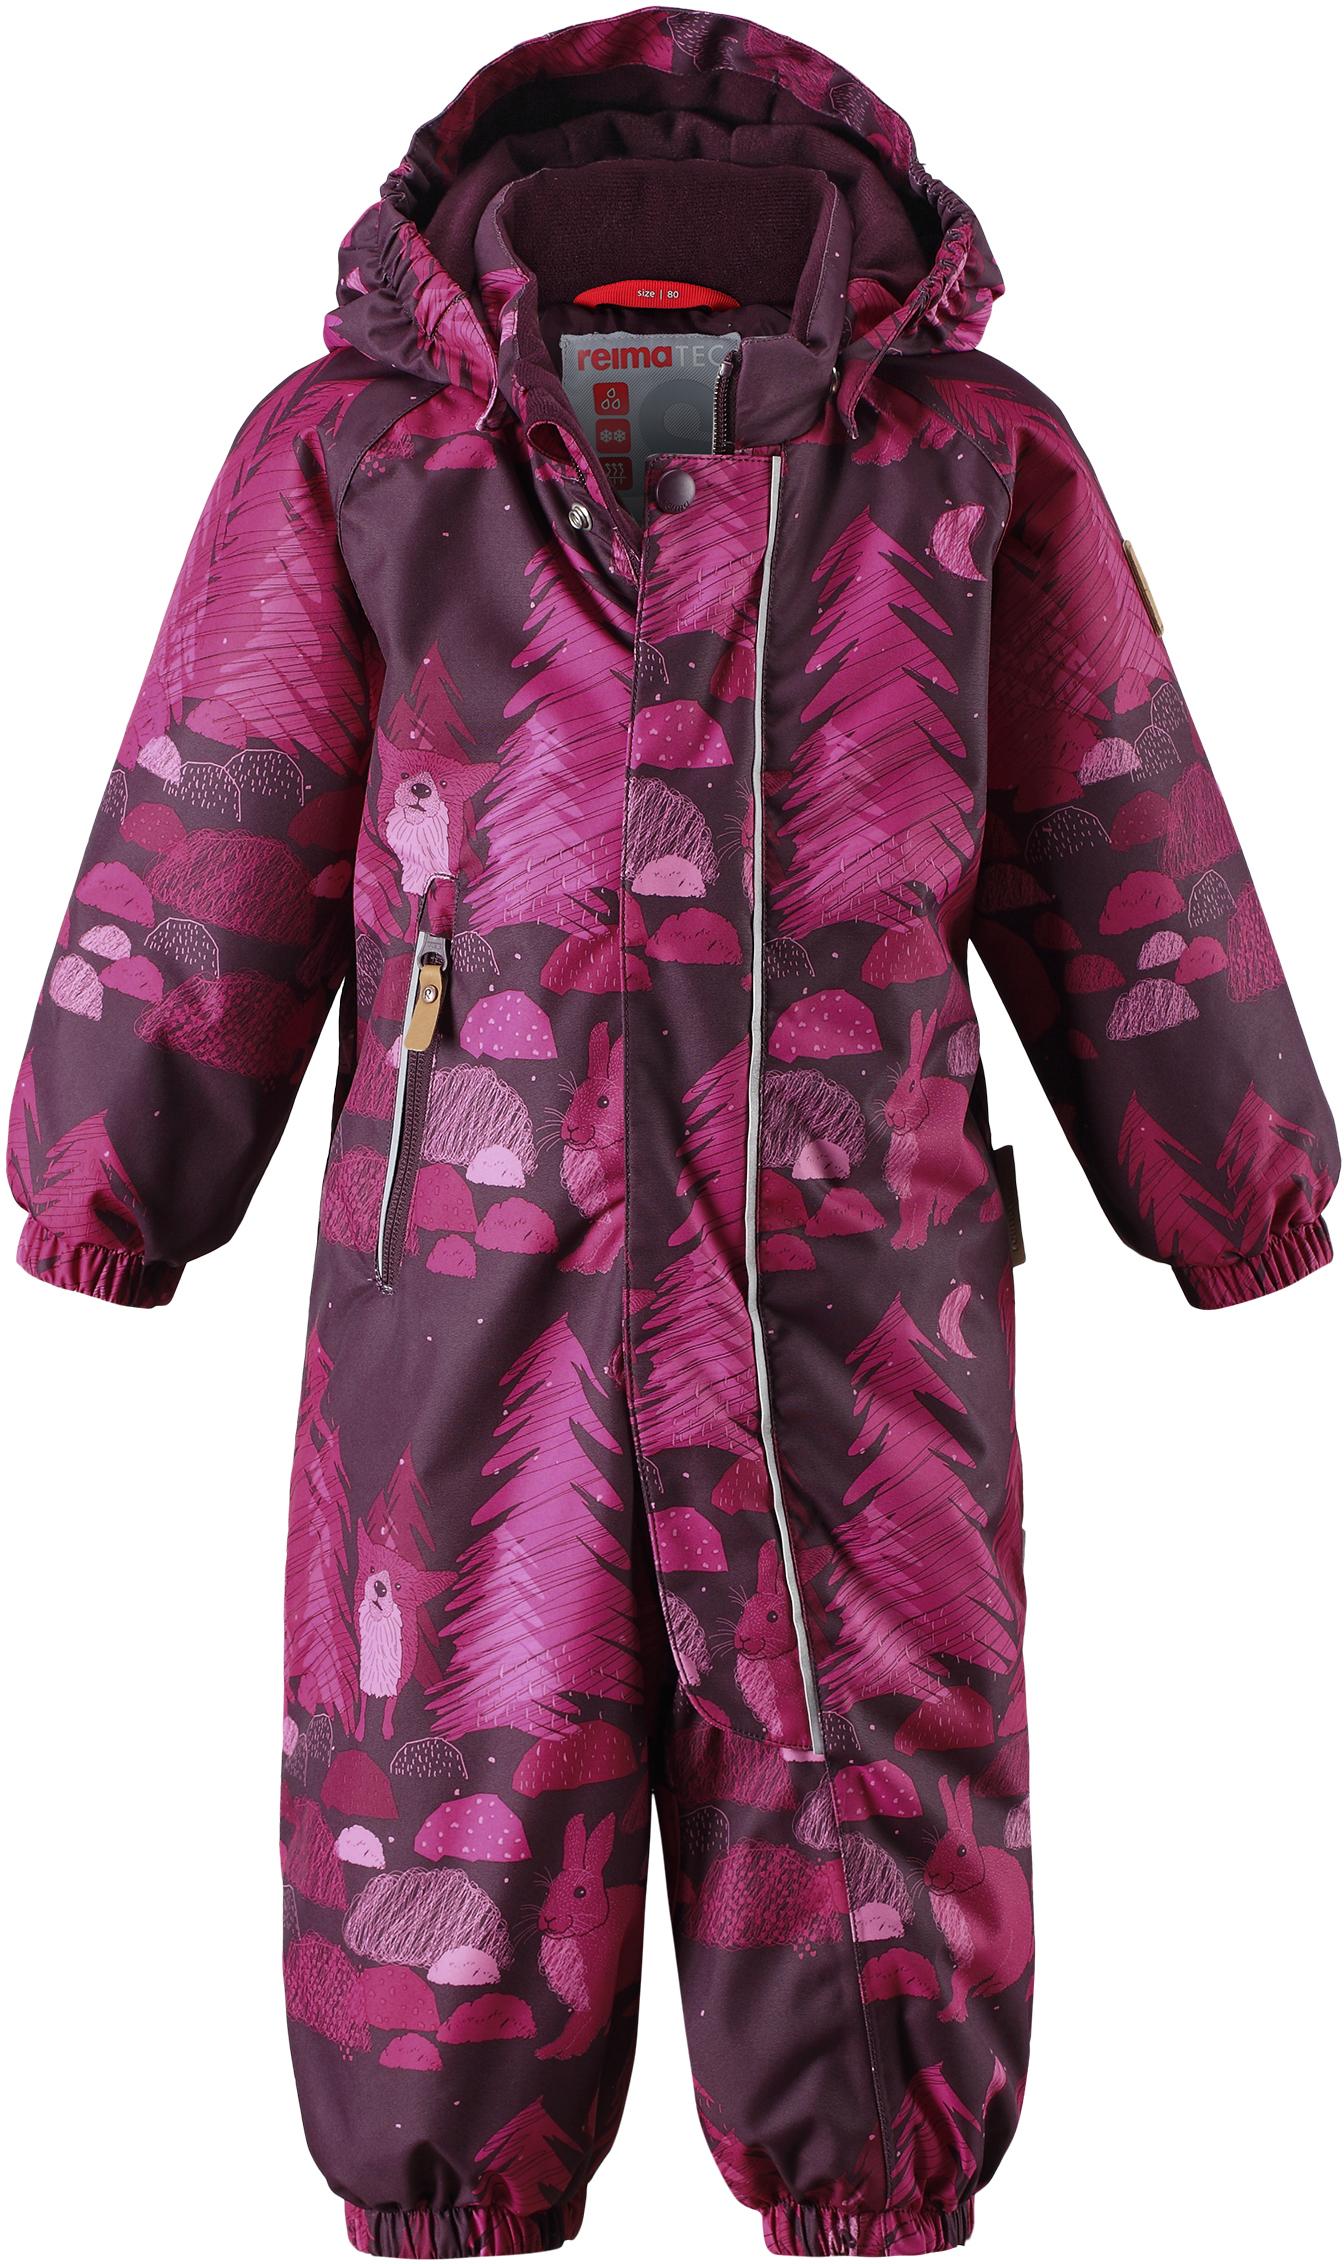 Reima winter overalls: customer reviews 67